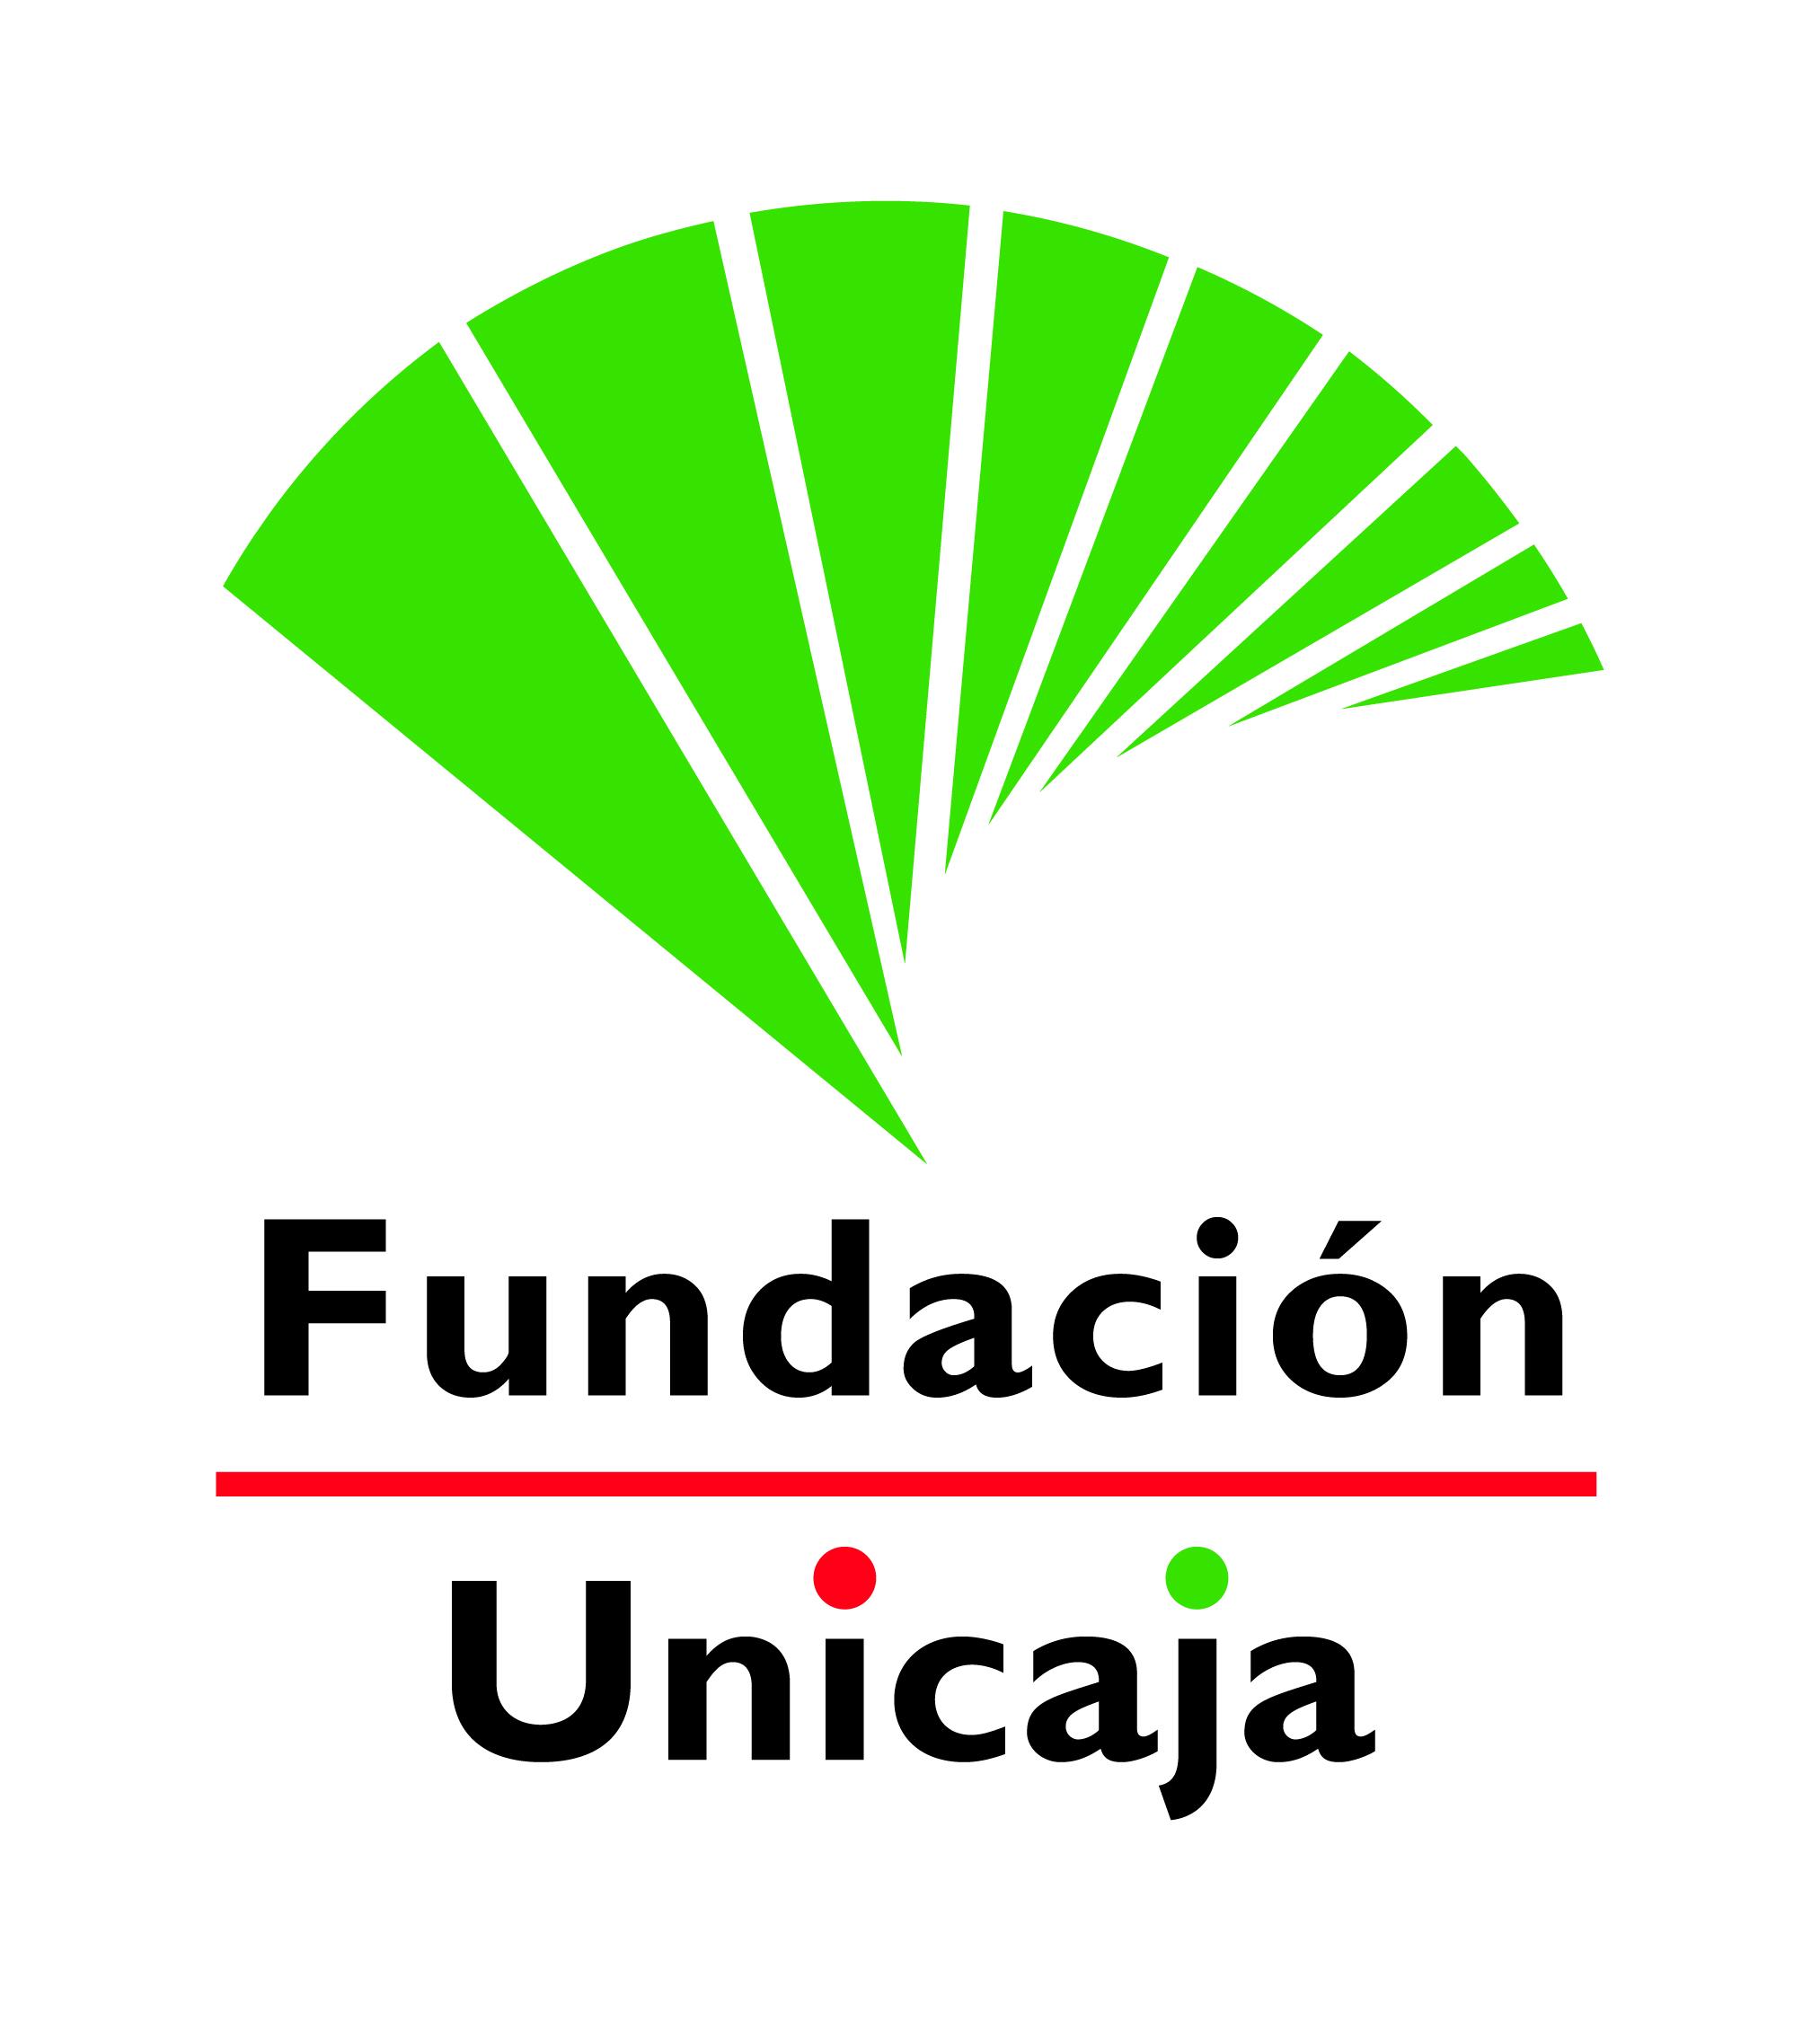 FundacionUnicaja